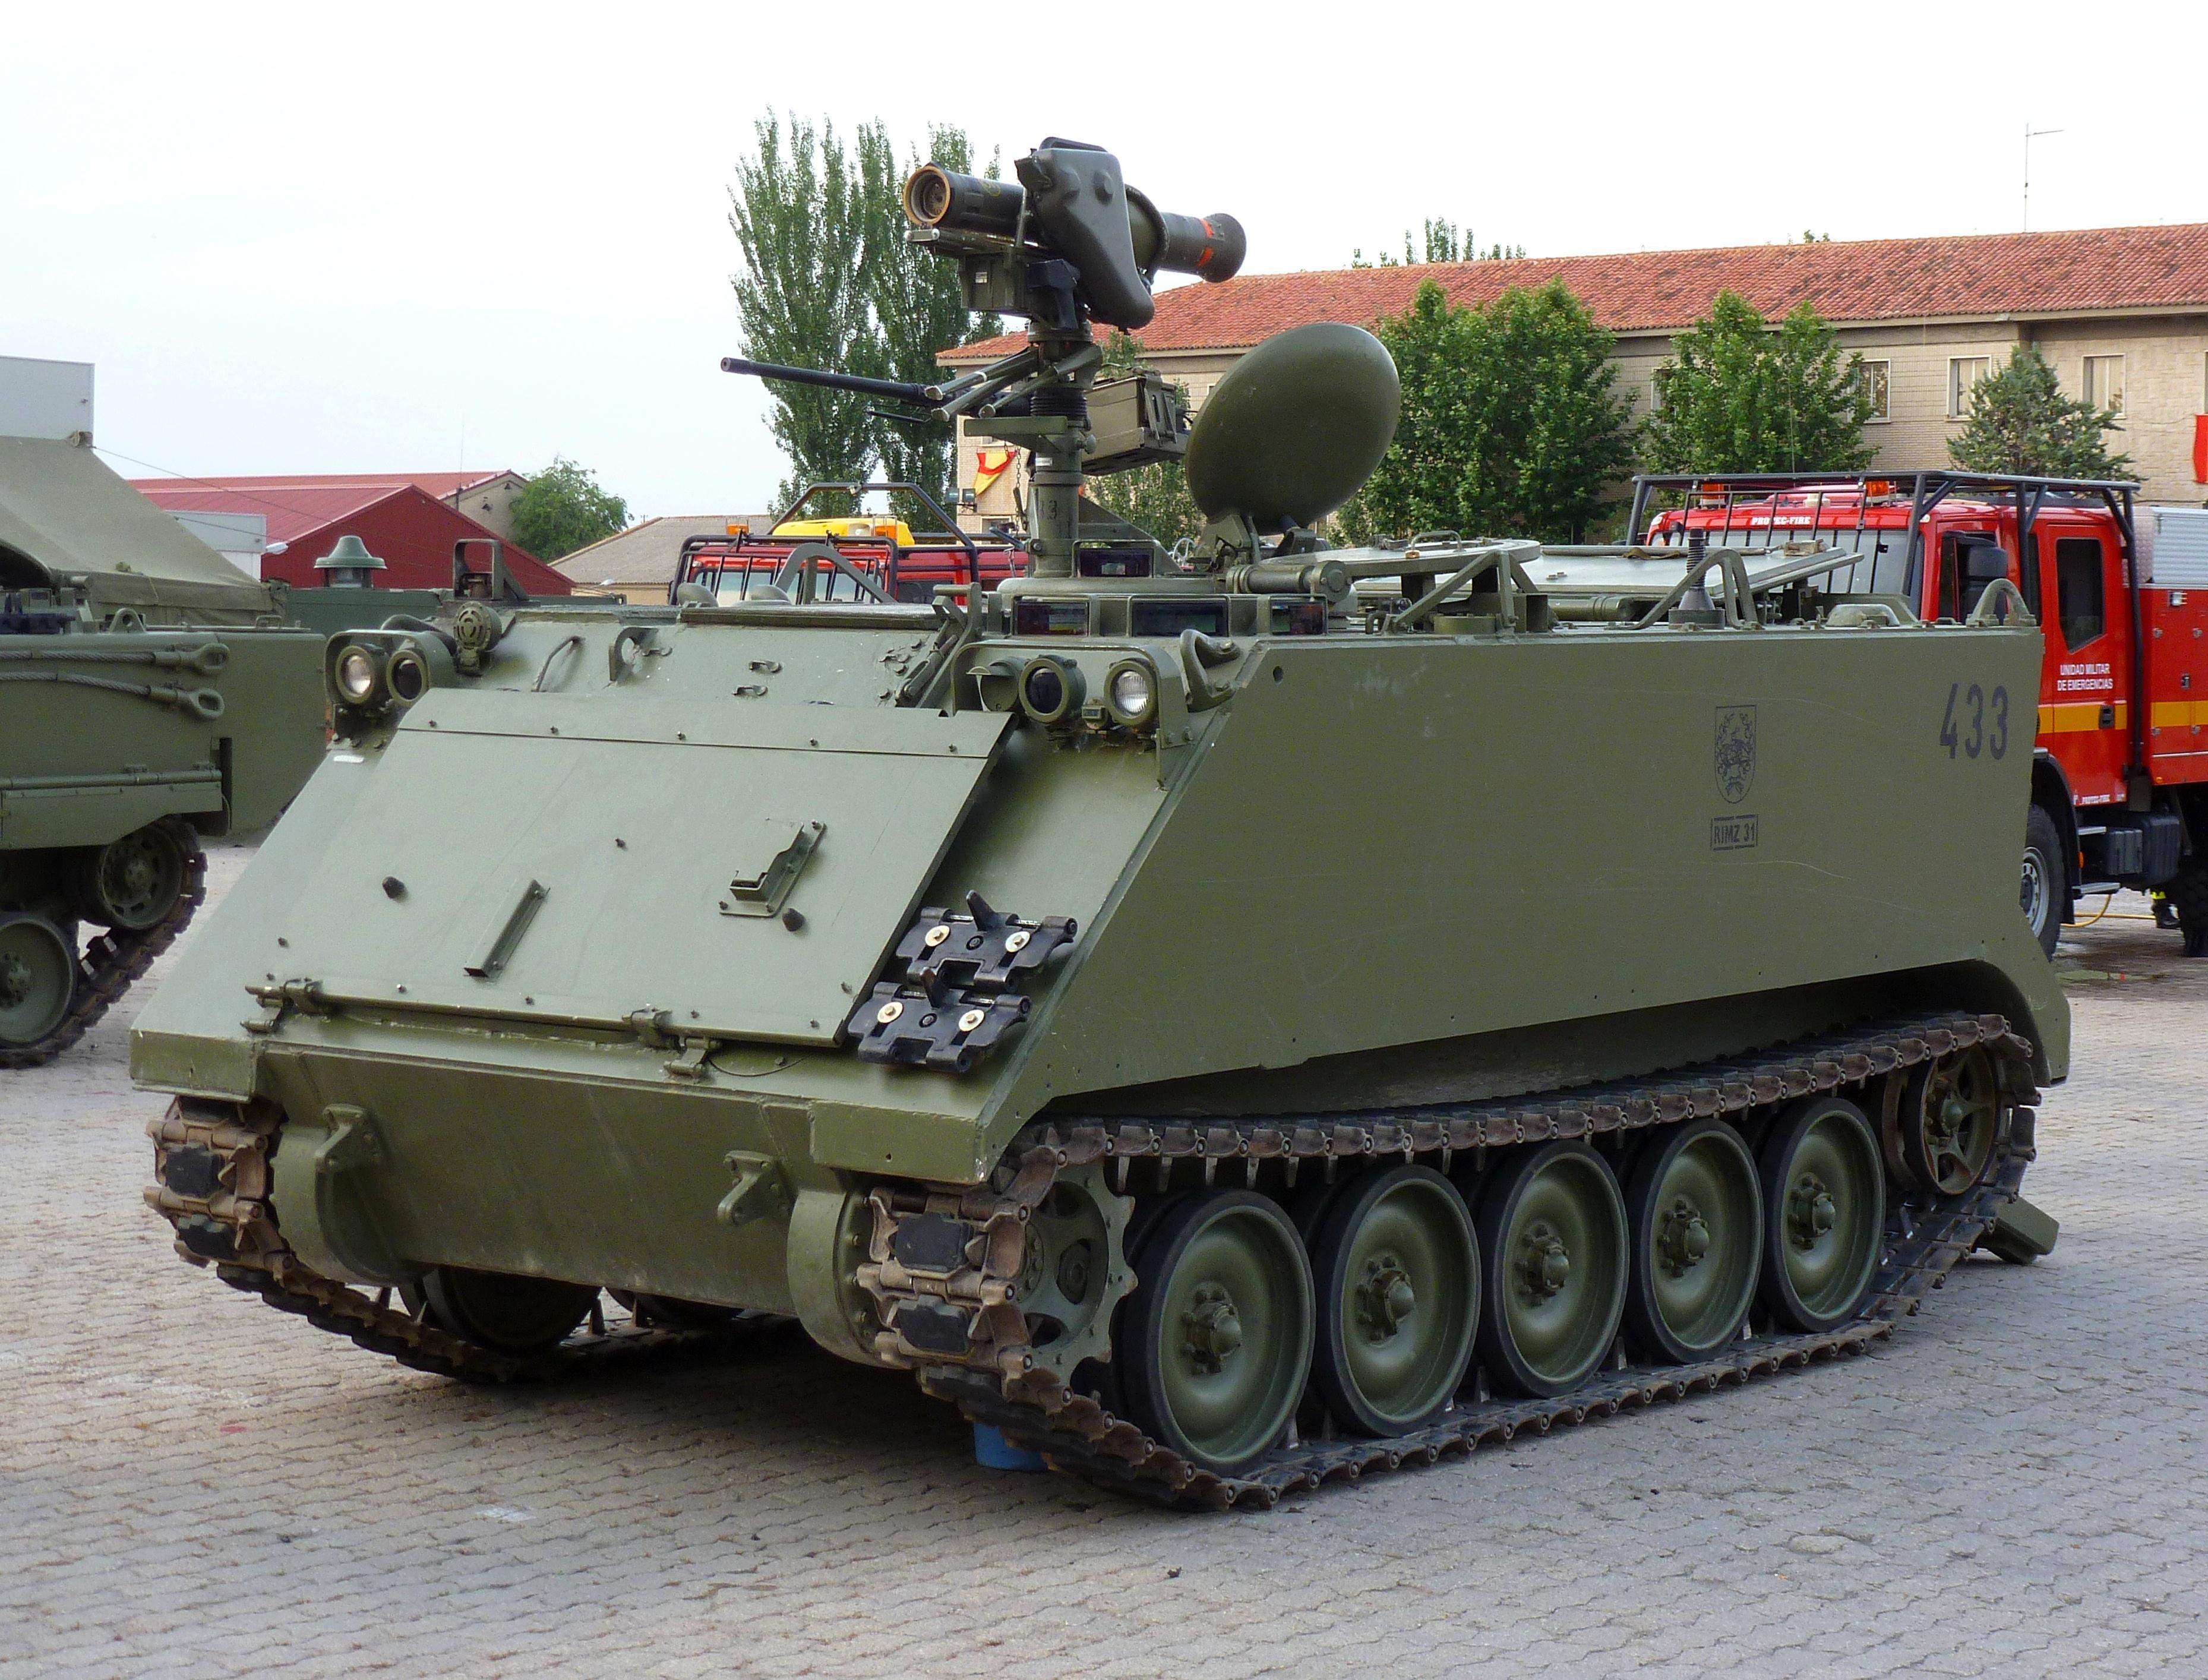 Army Tank For Sale Usa >> File:M-113 MILAN Ejército Español.JPG - Wikimedia Commons